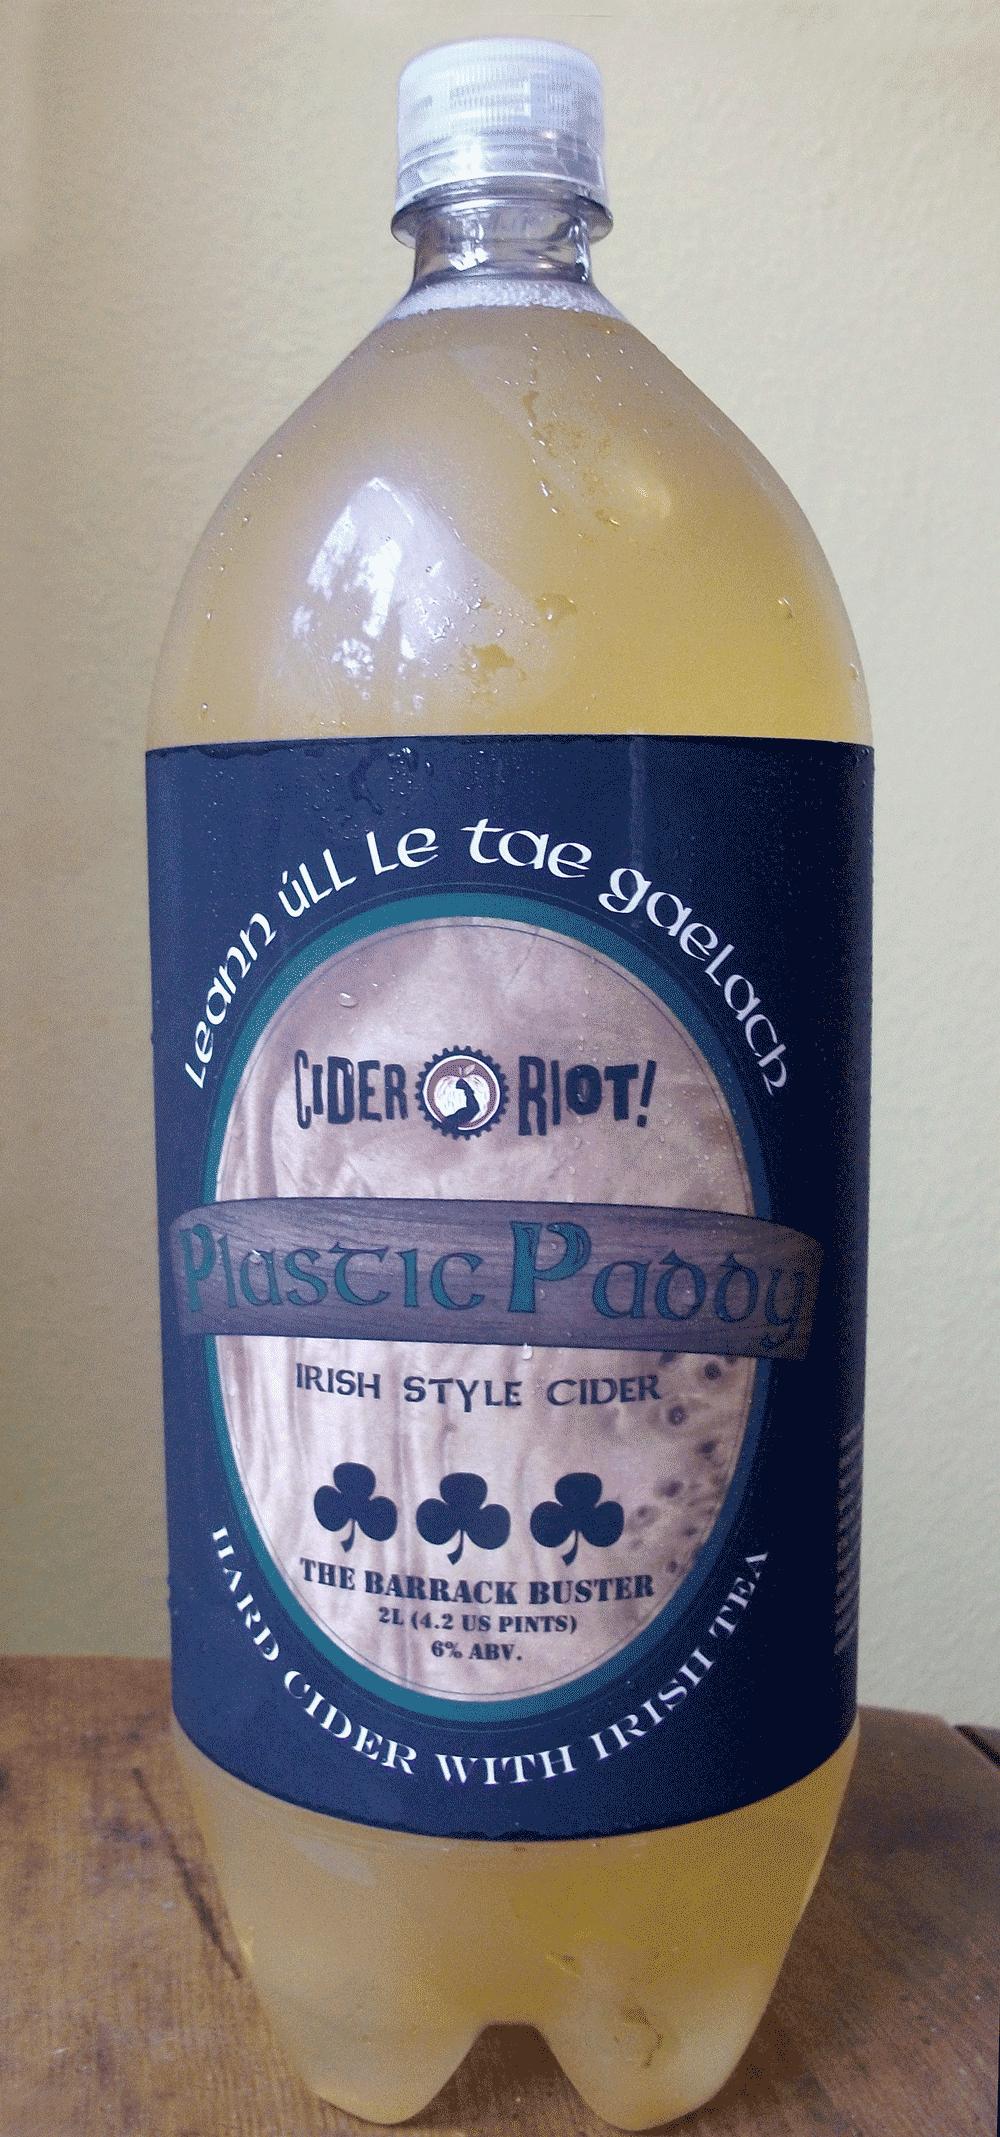 Cider Riot! Plastic Paddy Irish Style Cider